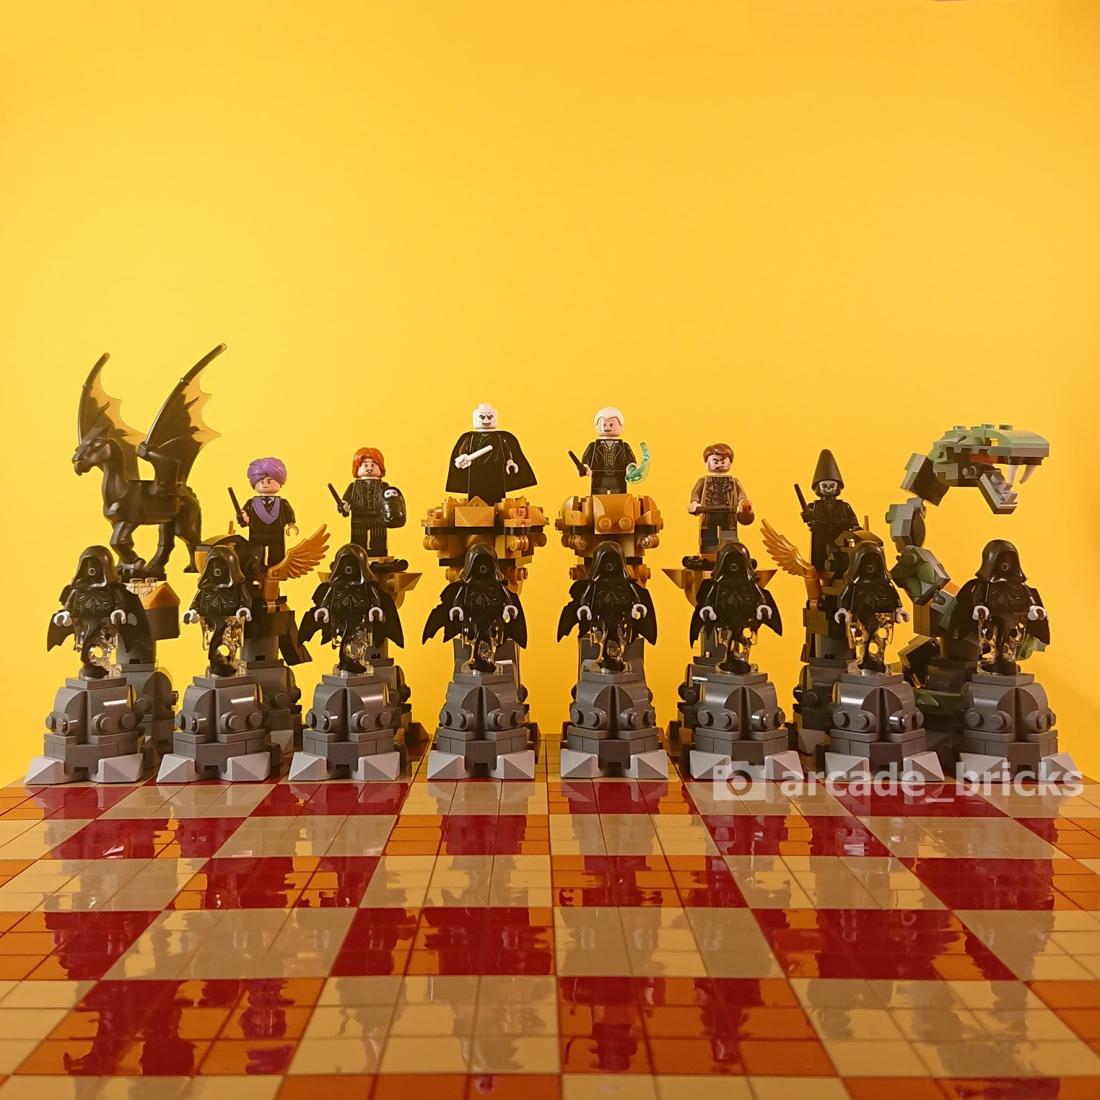 arcade_bricks_chess_evil_00_all